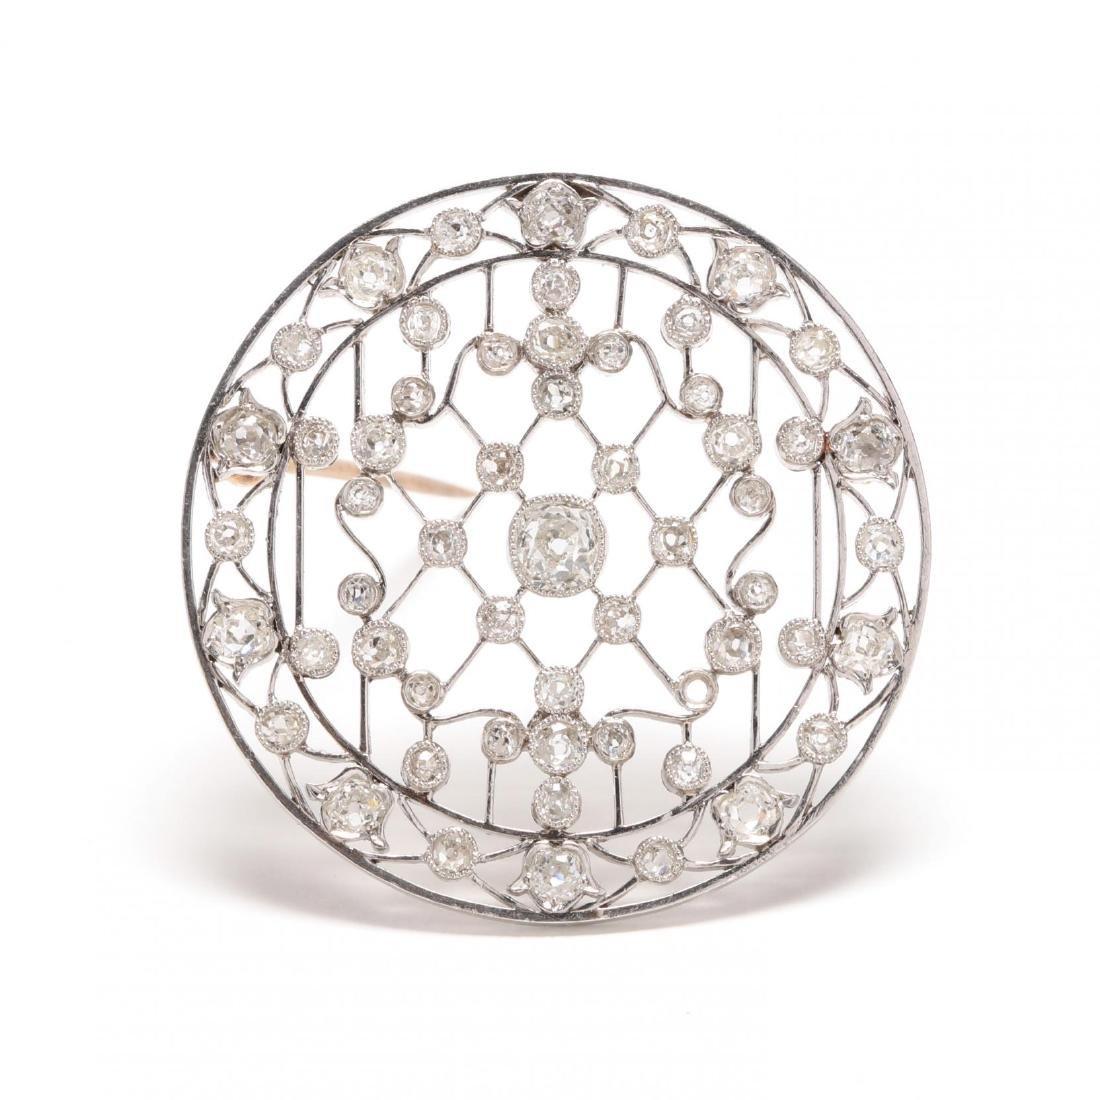 Edwardian Platinum and Diamond Pendant / Brooch